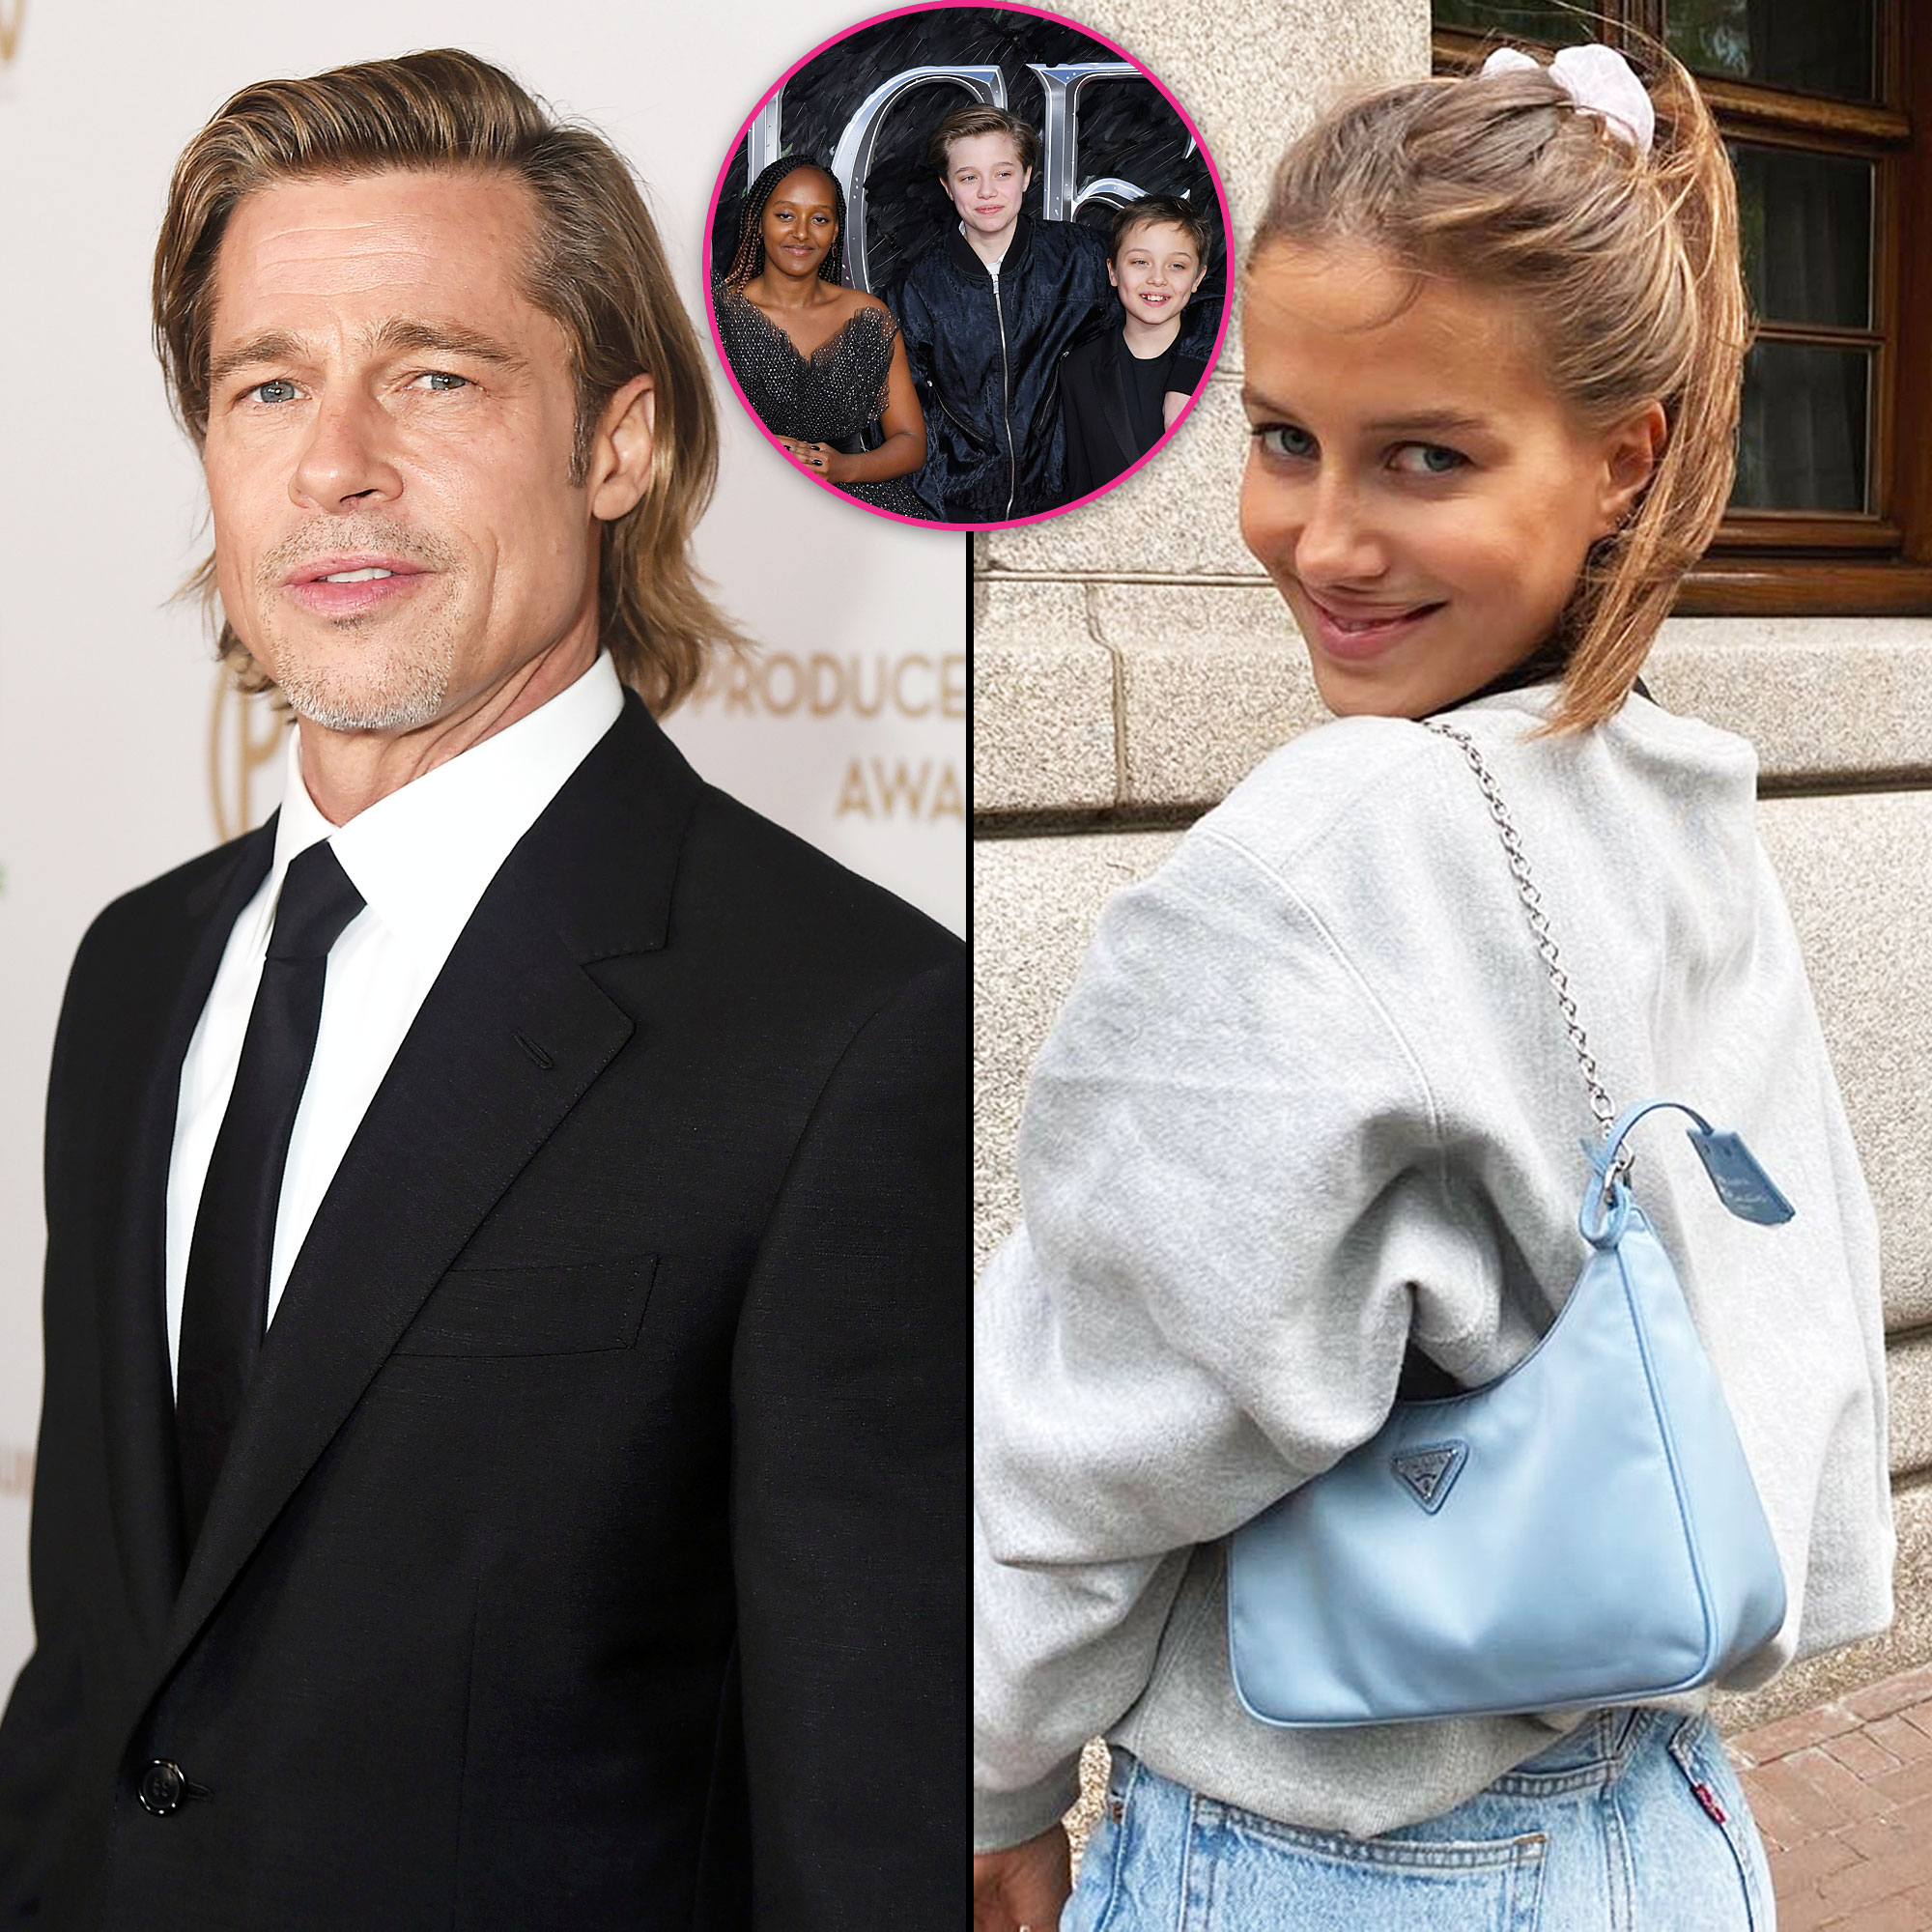 Brad Pitt Is Confident His Kids Will Love His Girlfriend Nicole Poturalski